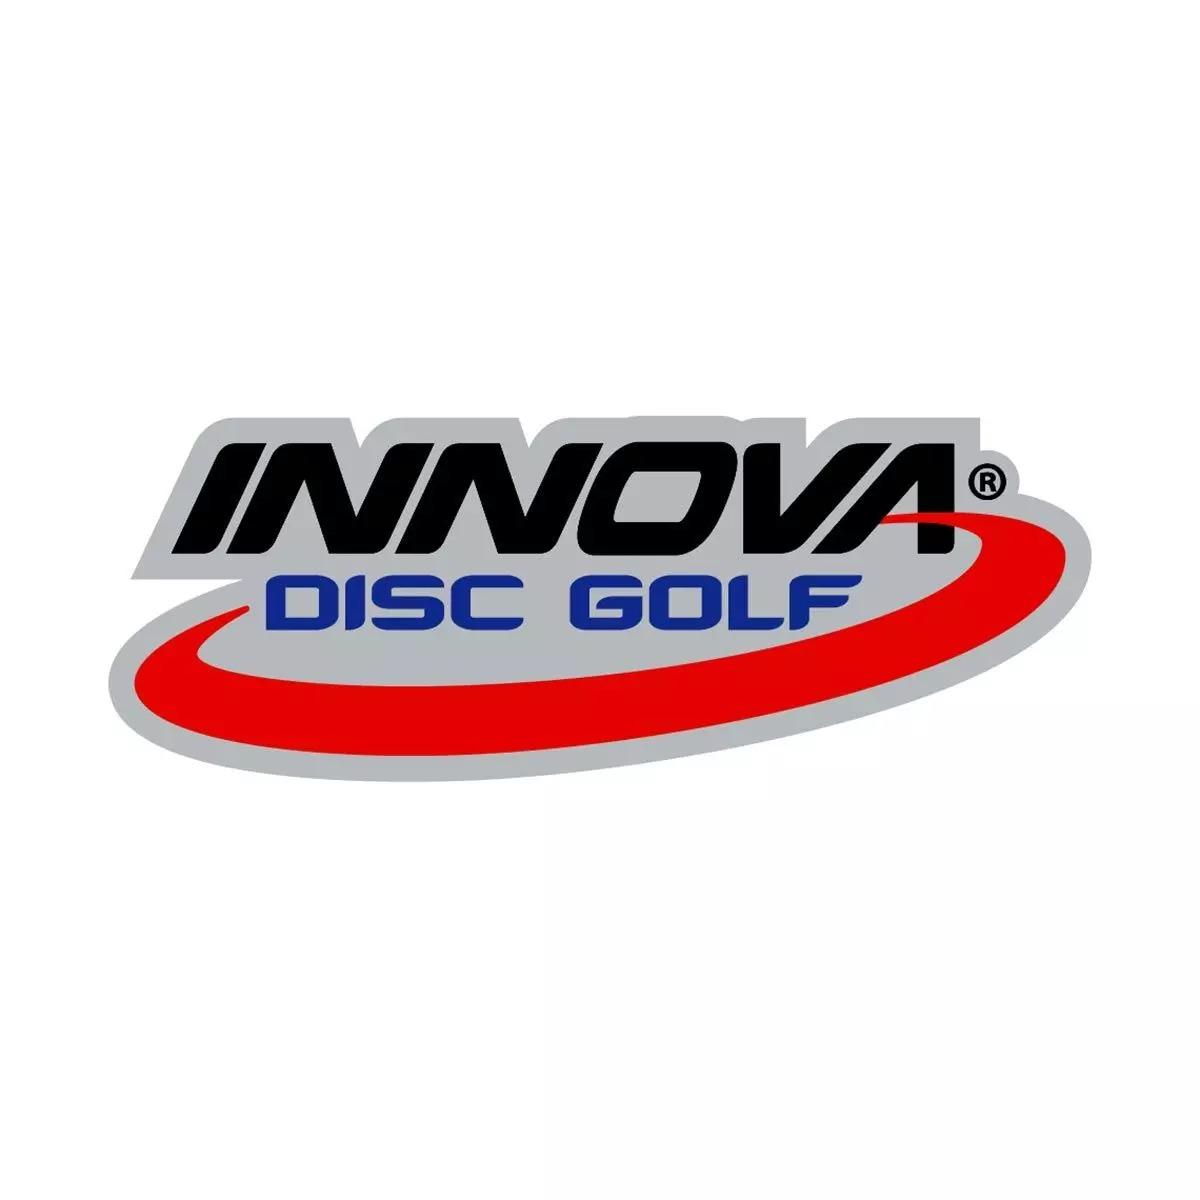 Disc Golf Stickers